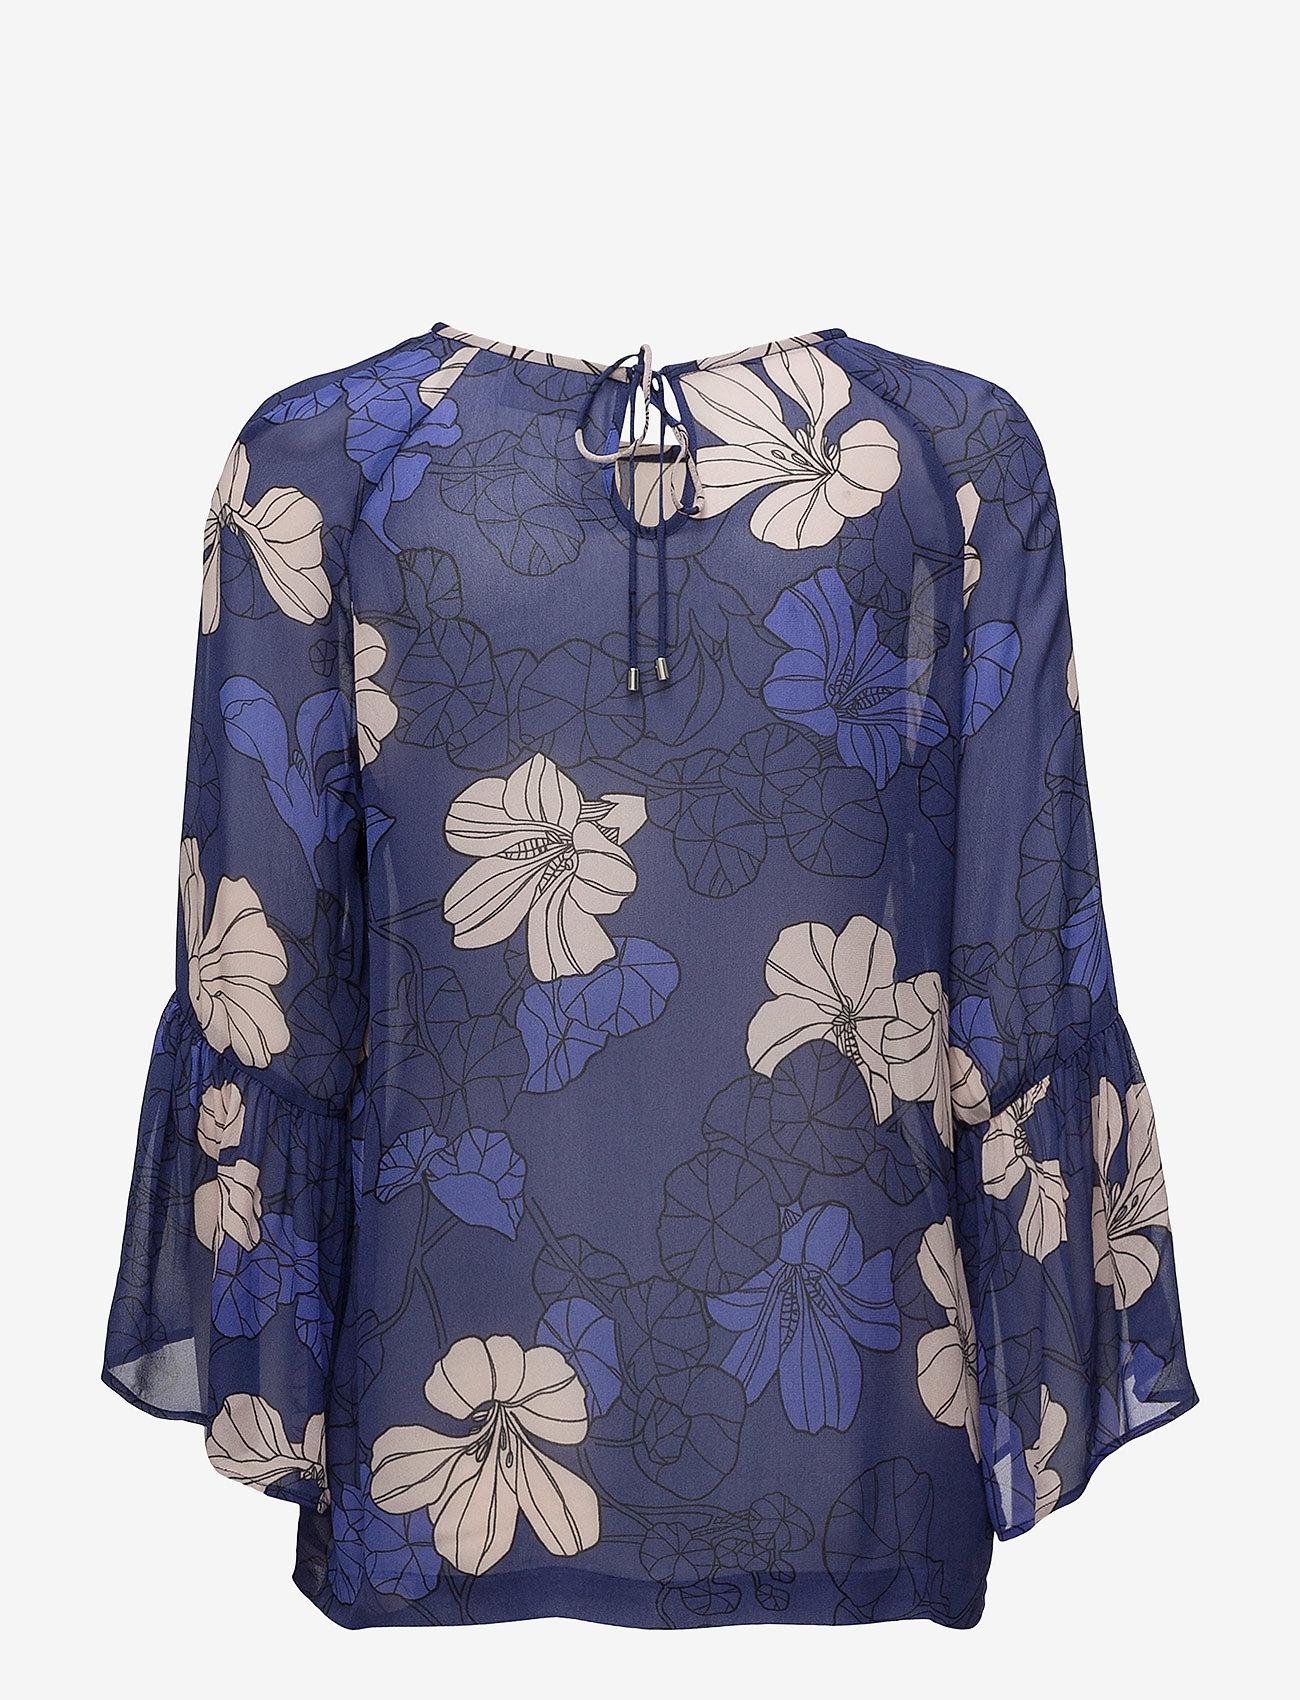 Begonia Blouse Lw (Spring Flowers Orient Blue) - InWear UFKDKC